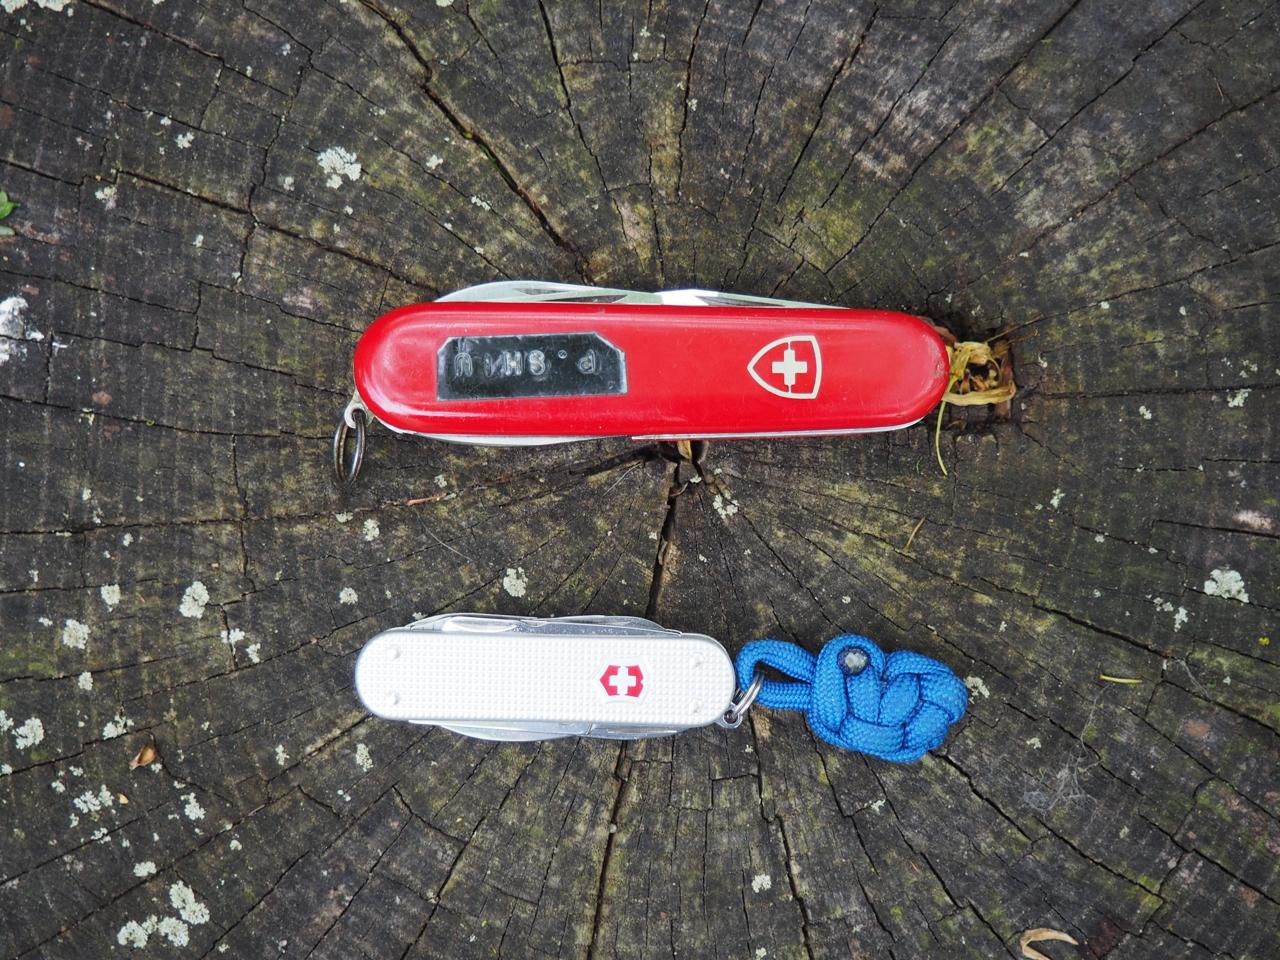 My very old Swiss Army Knive (SAK) and my very new (2015) SAK alox mini-champ